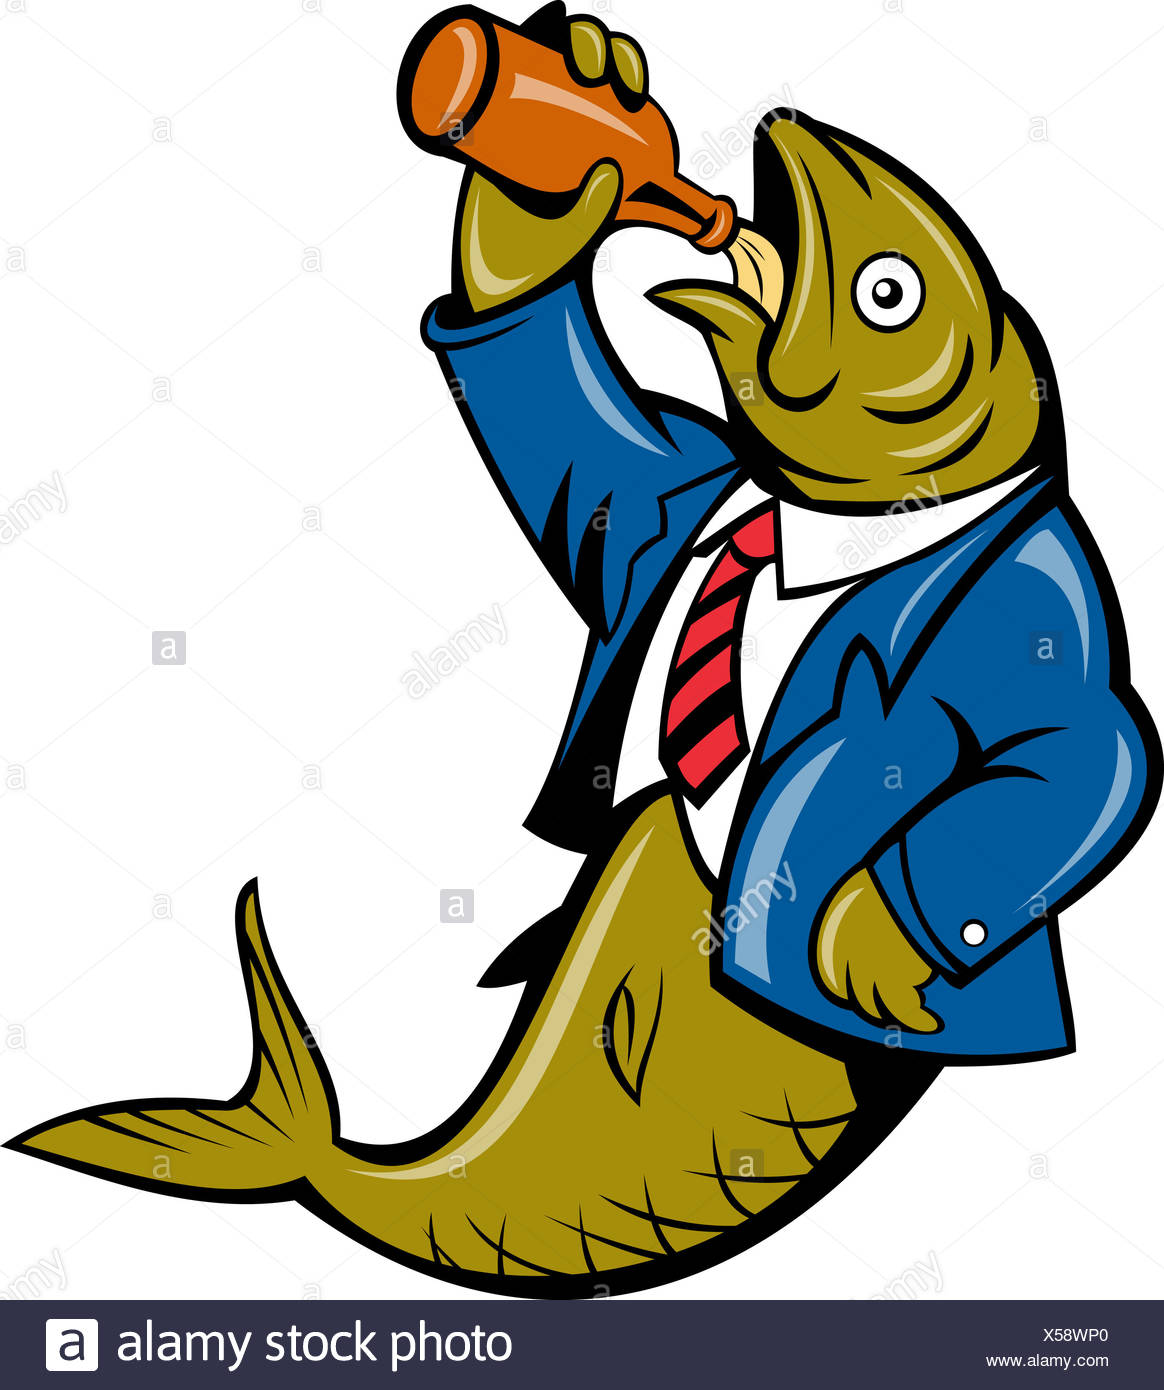 Herring Fish Business Suit Drinking Beer Bottle Stock Photo